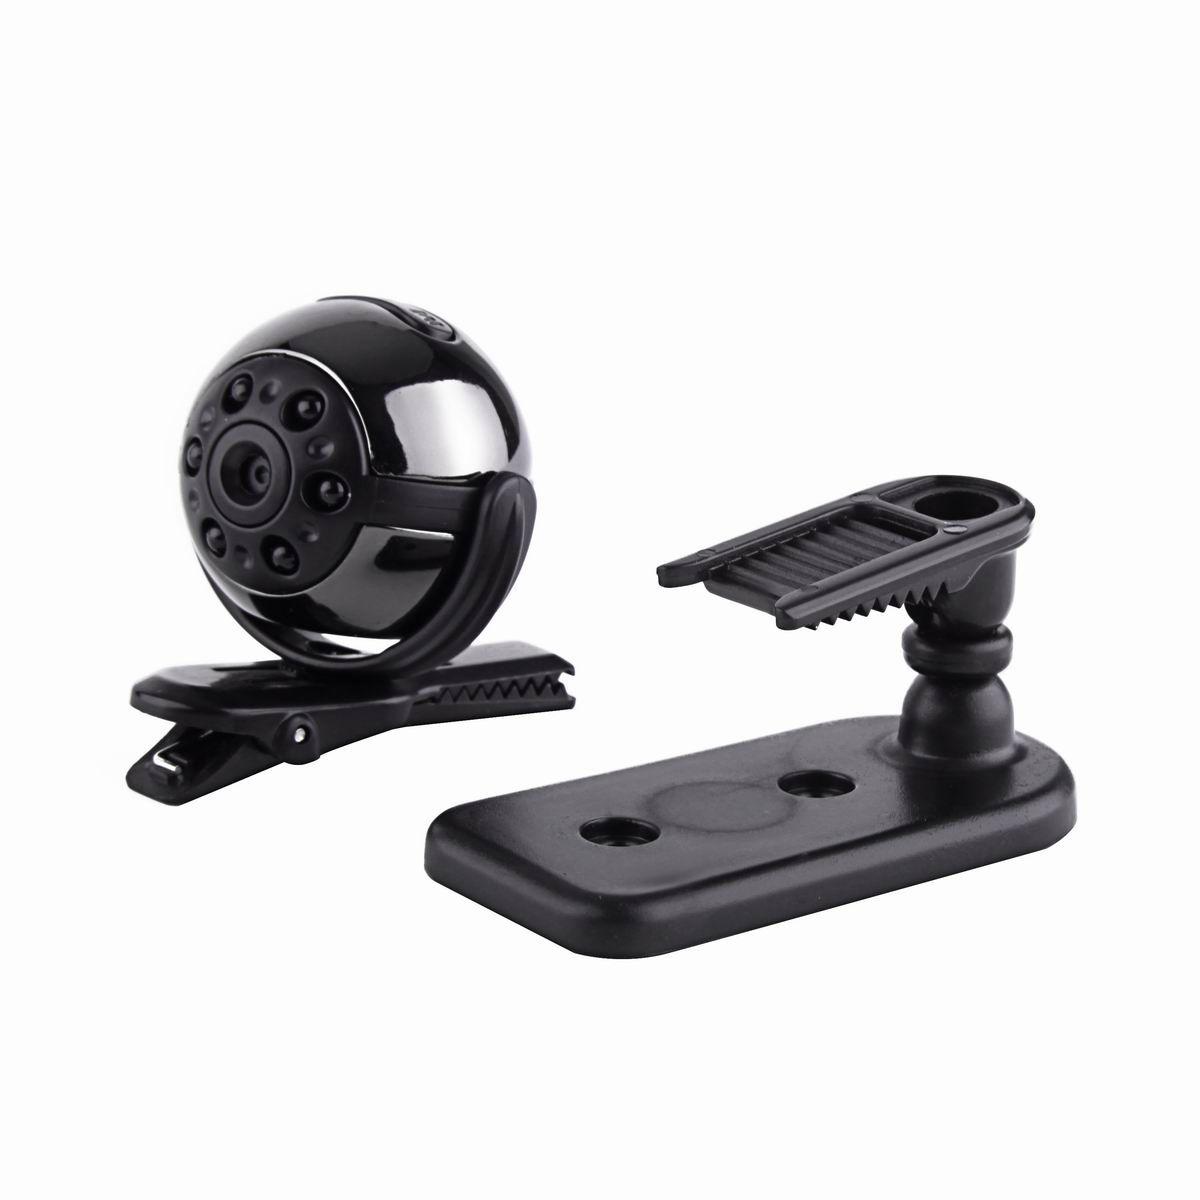 360 degree View SQ9 Mini DV HD 1080P Sport Camera 12MP Car DVR Motion Detecting Video Multifunction Infrared lamp Voice Video Recorder